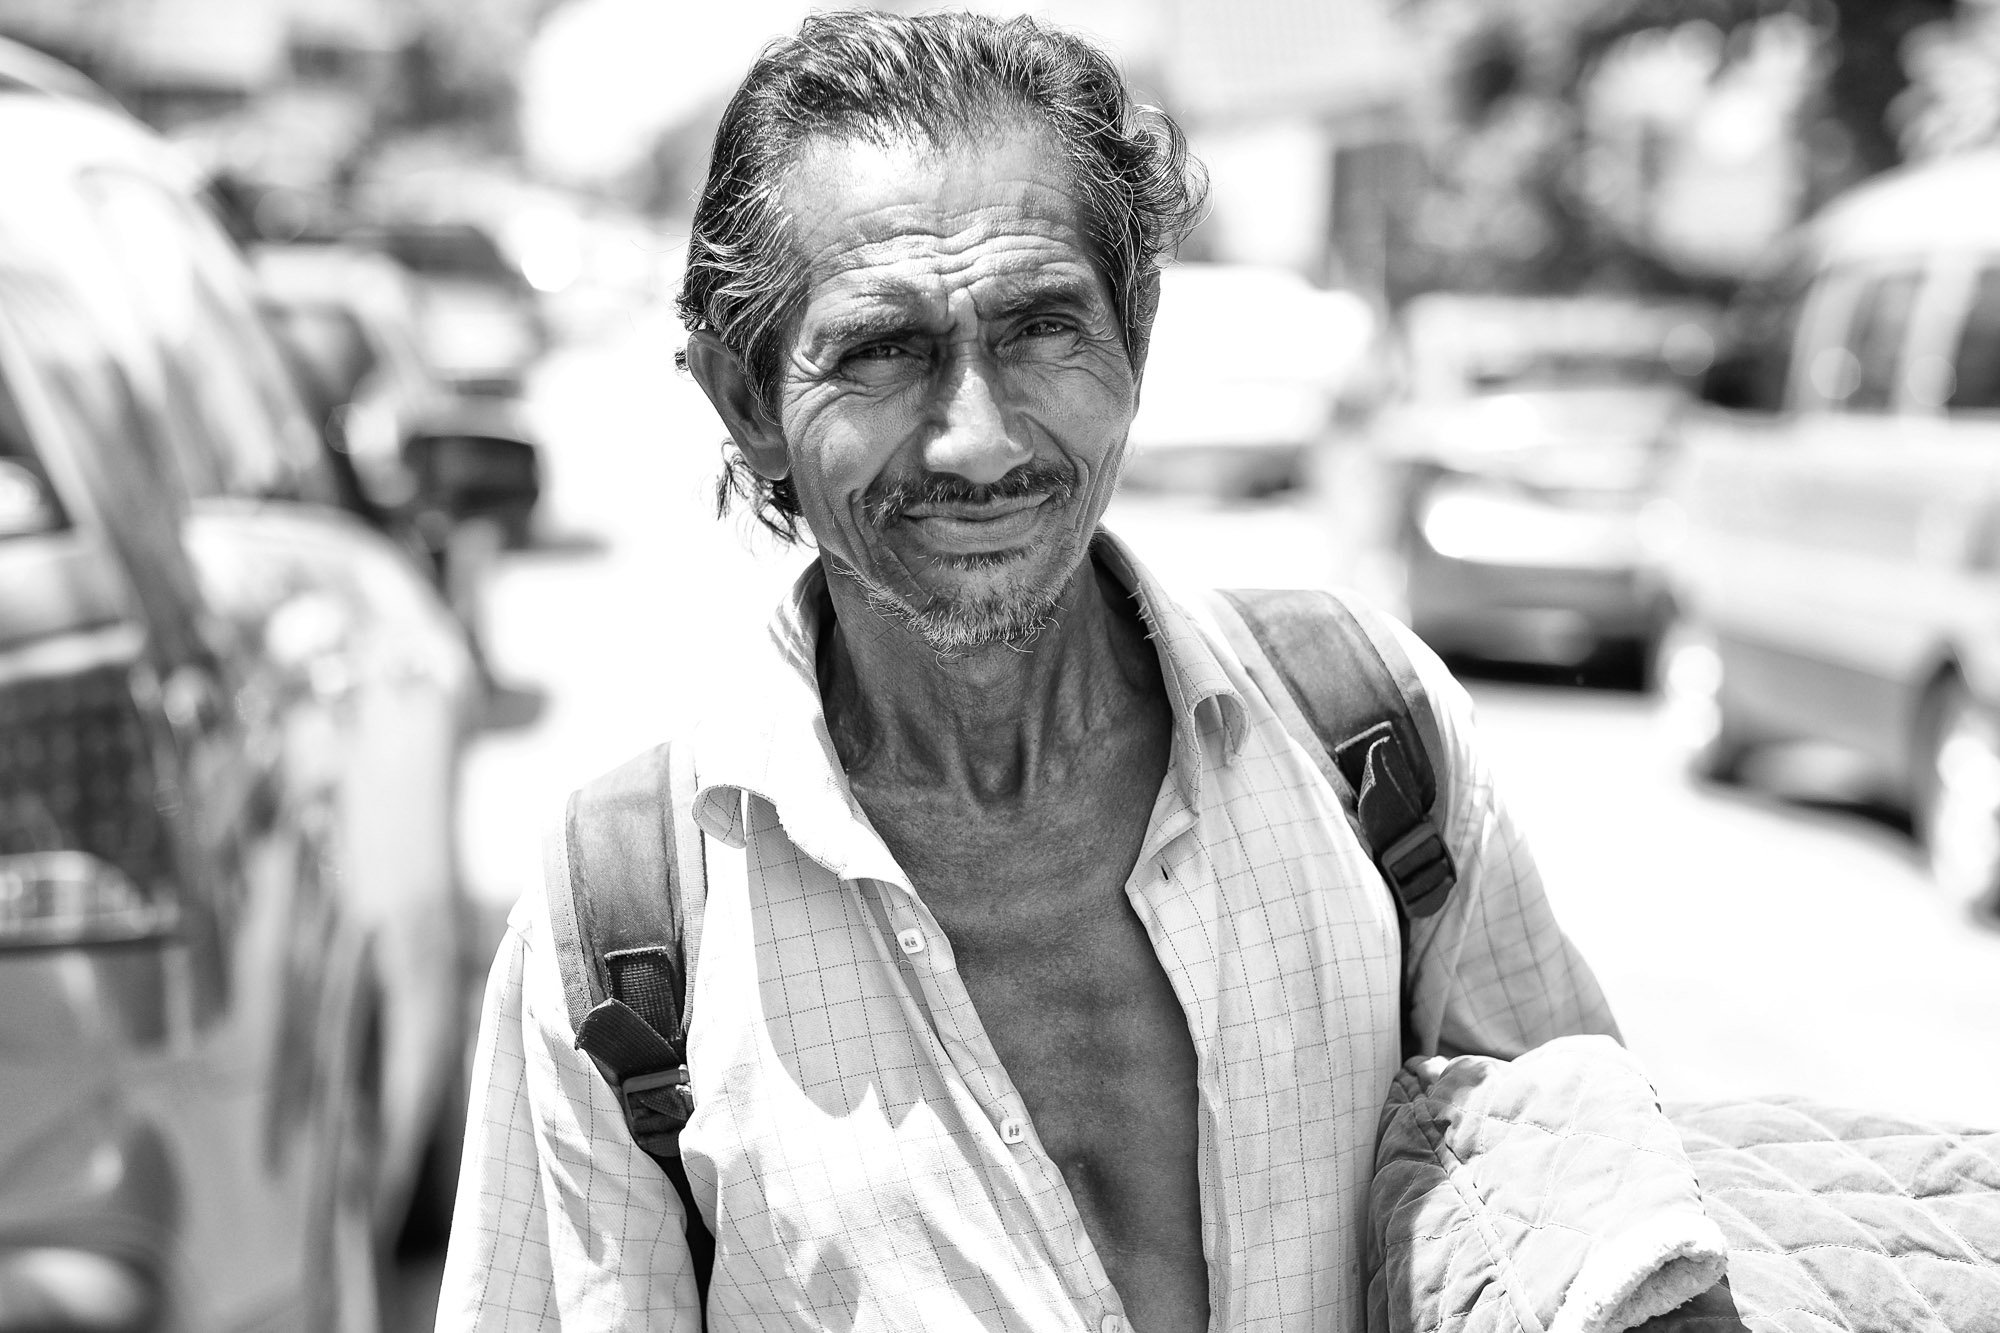 man hot day VIENTIANE Laos asia street photography photographer